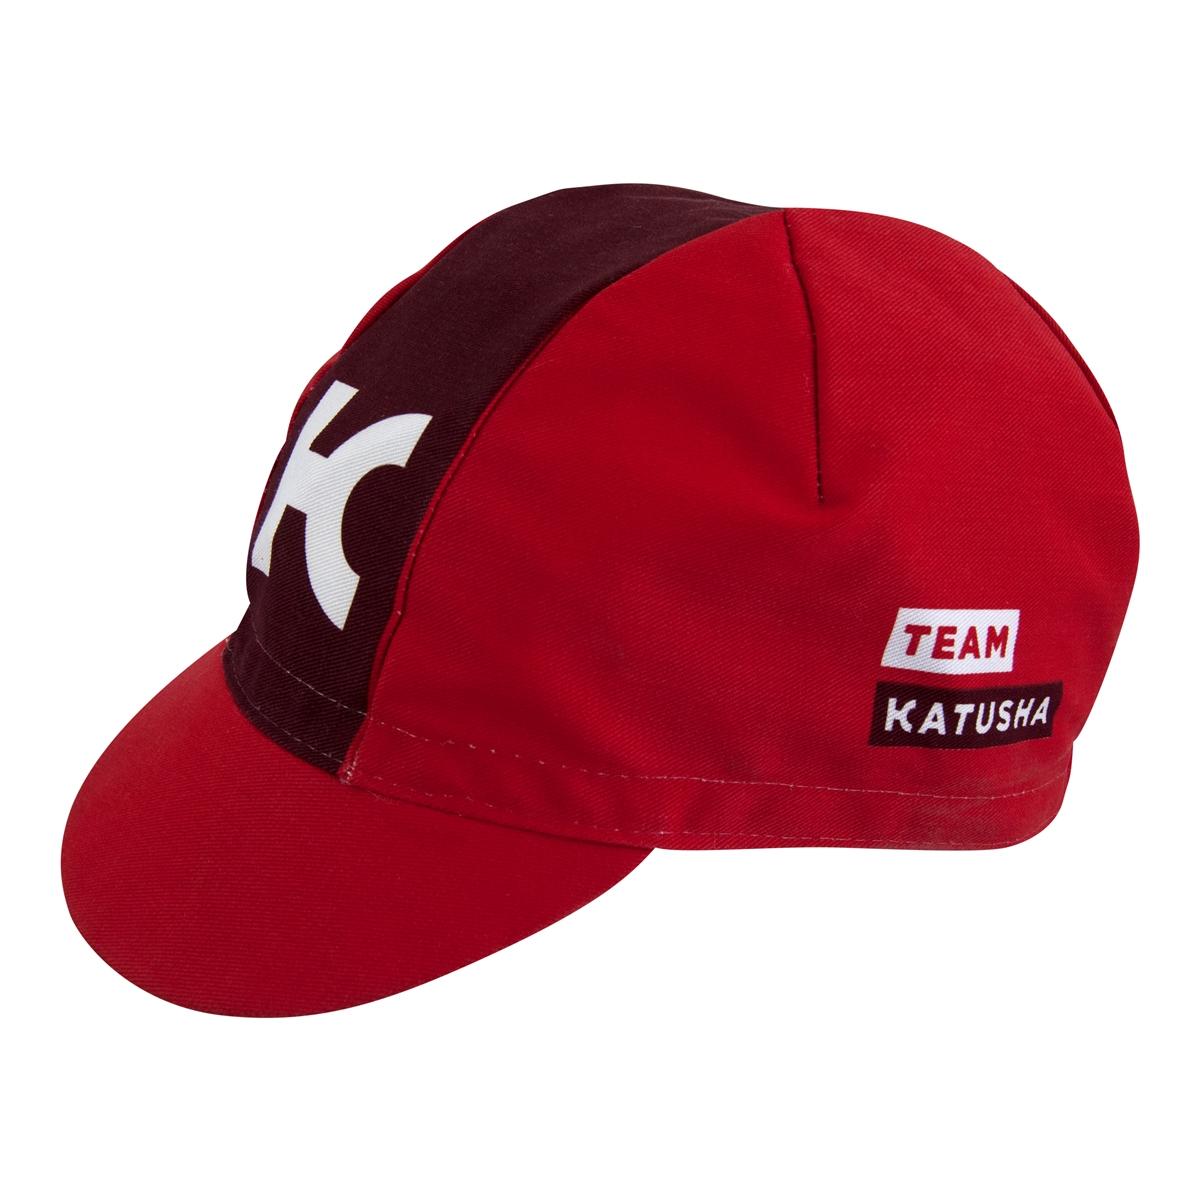 KATUSHA Itera Canyon Cycling Cap Cotton Russian Pro Racing Team 2016 fc2f2b467